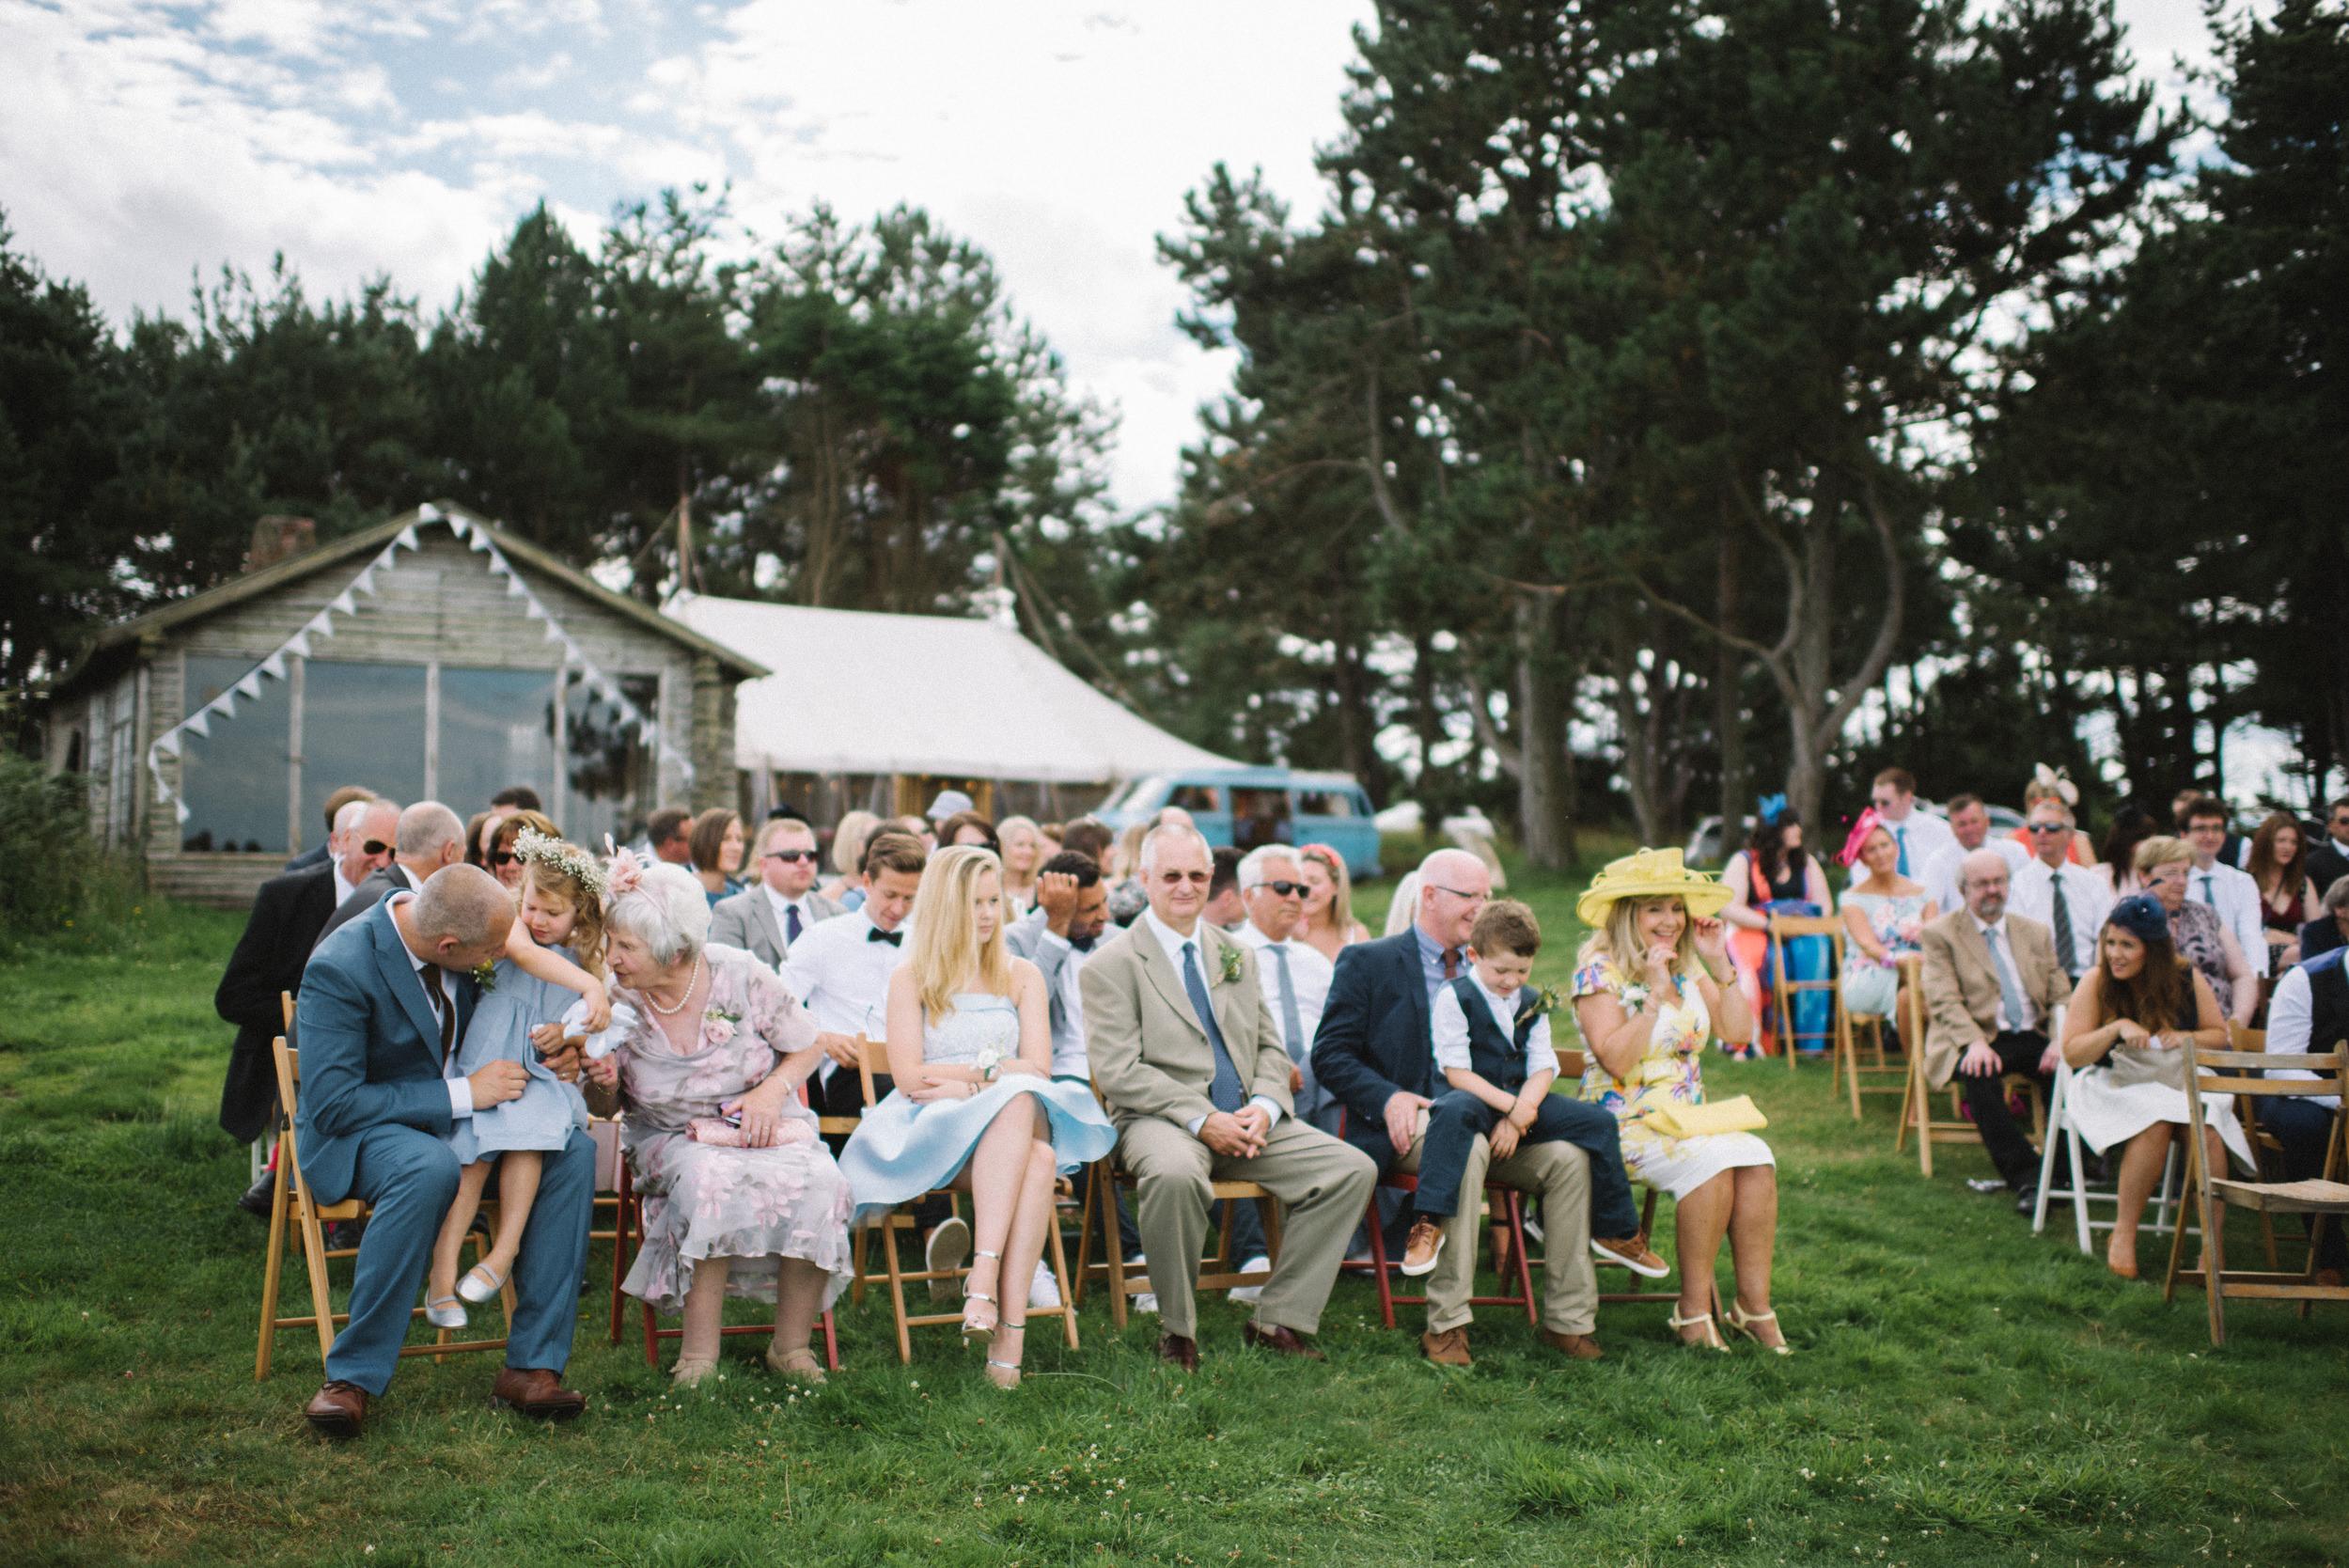 0146-alternative-wedding-portrait-family-kids-photographer-glasgow-scotland.JPG